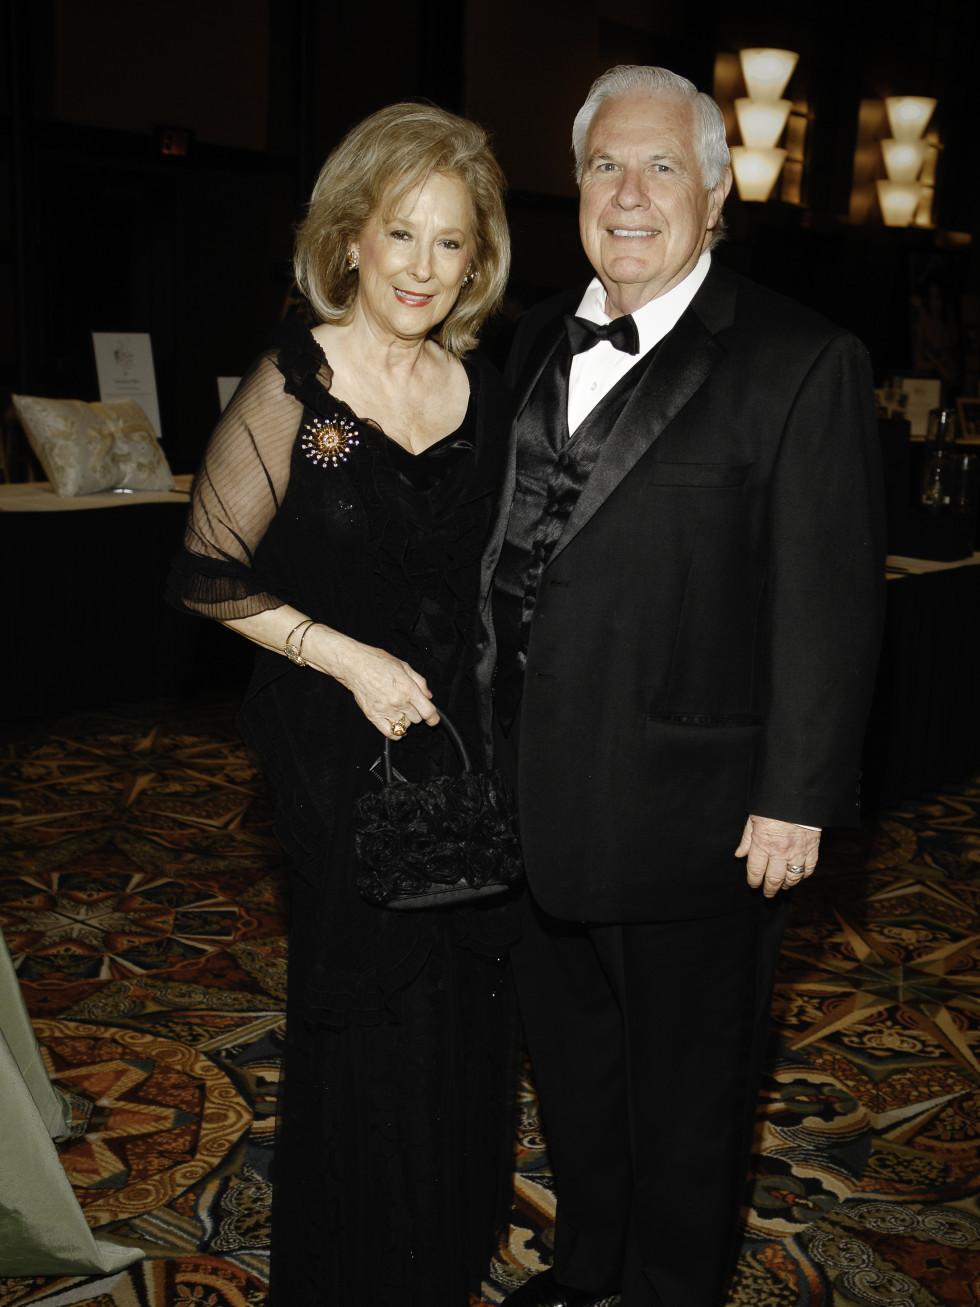 News_Symphony Ball_March 2010_Mary Ann McKeithan_David McKeithan